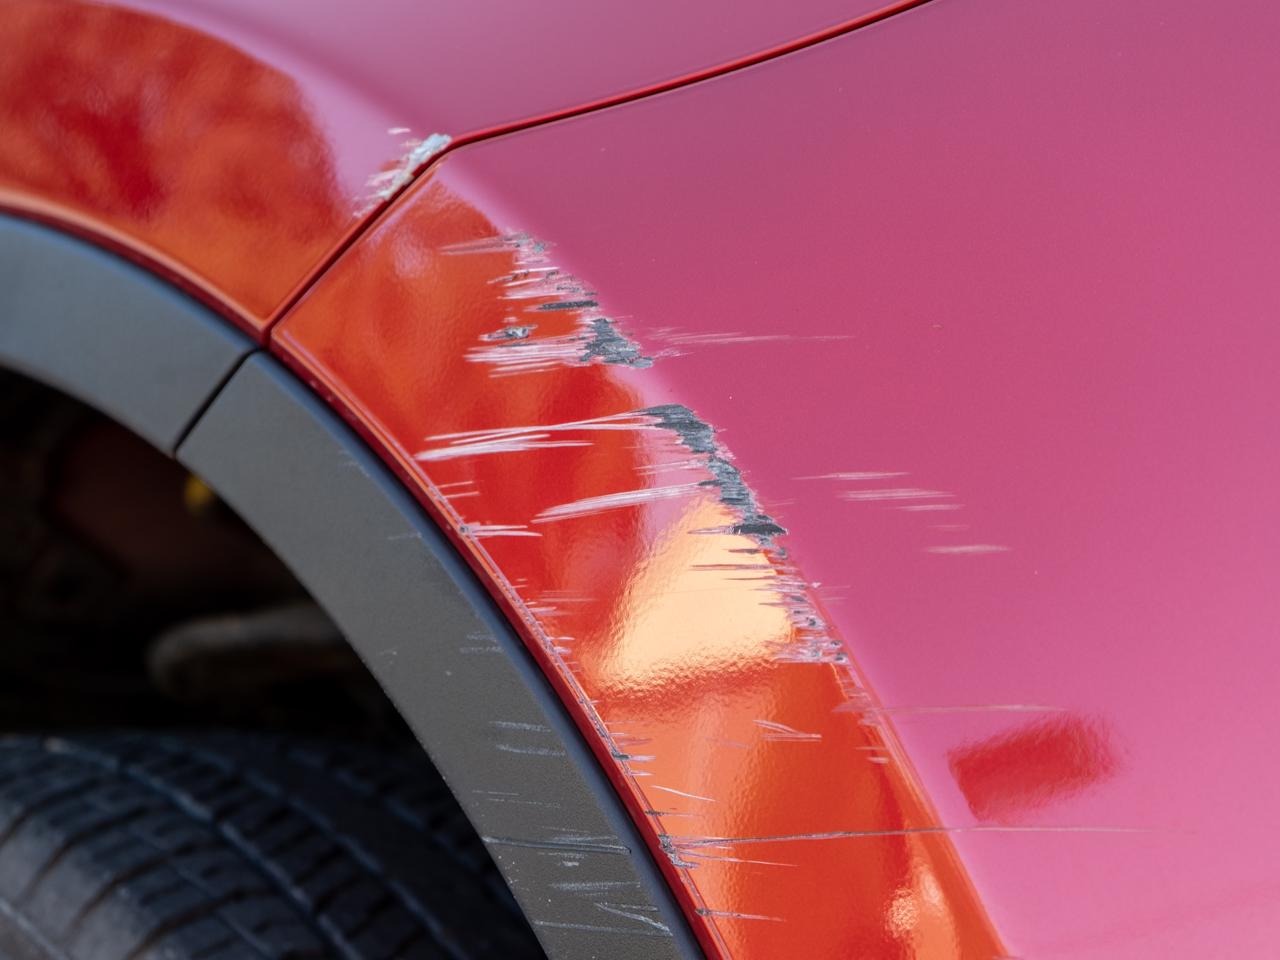 Best Car Scratch Remover 2021 - TrueCar Blog